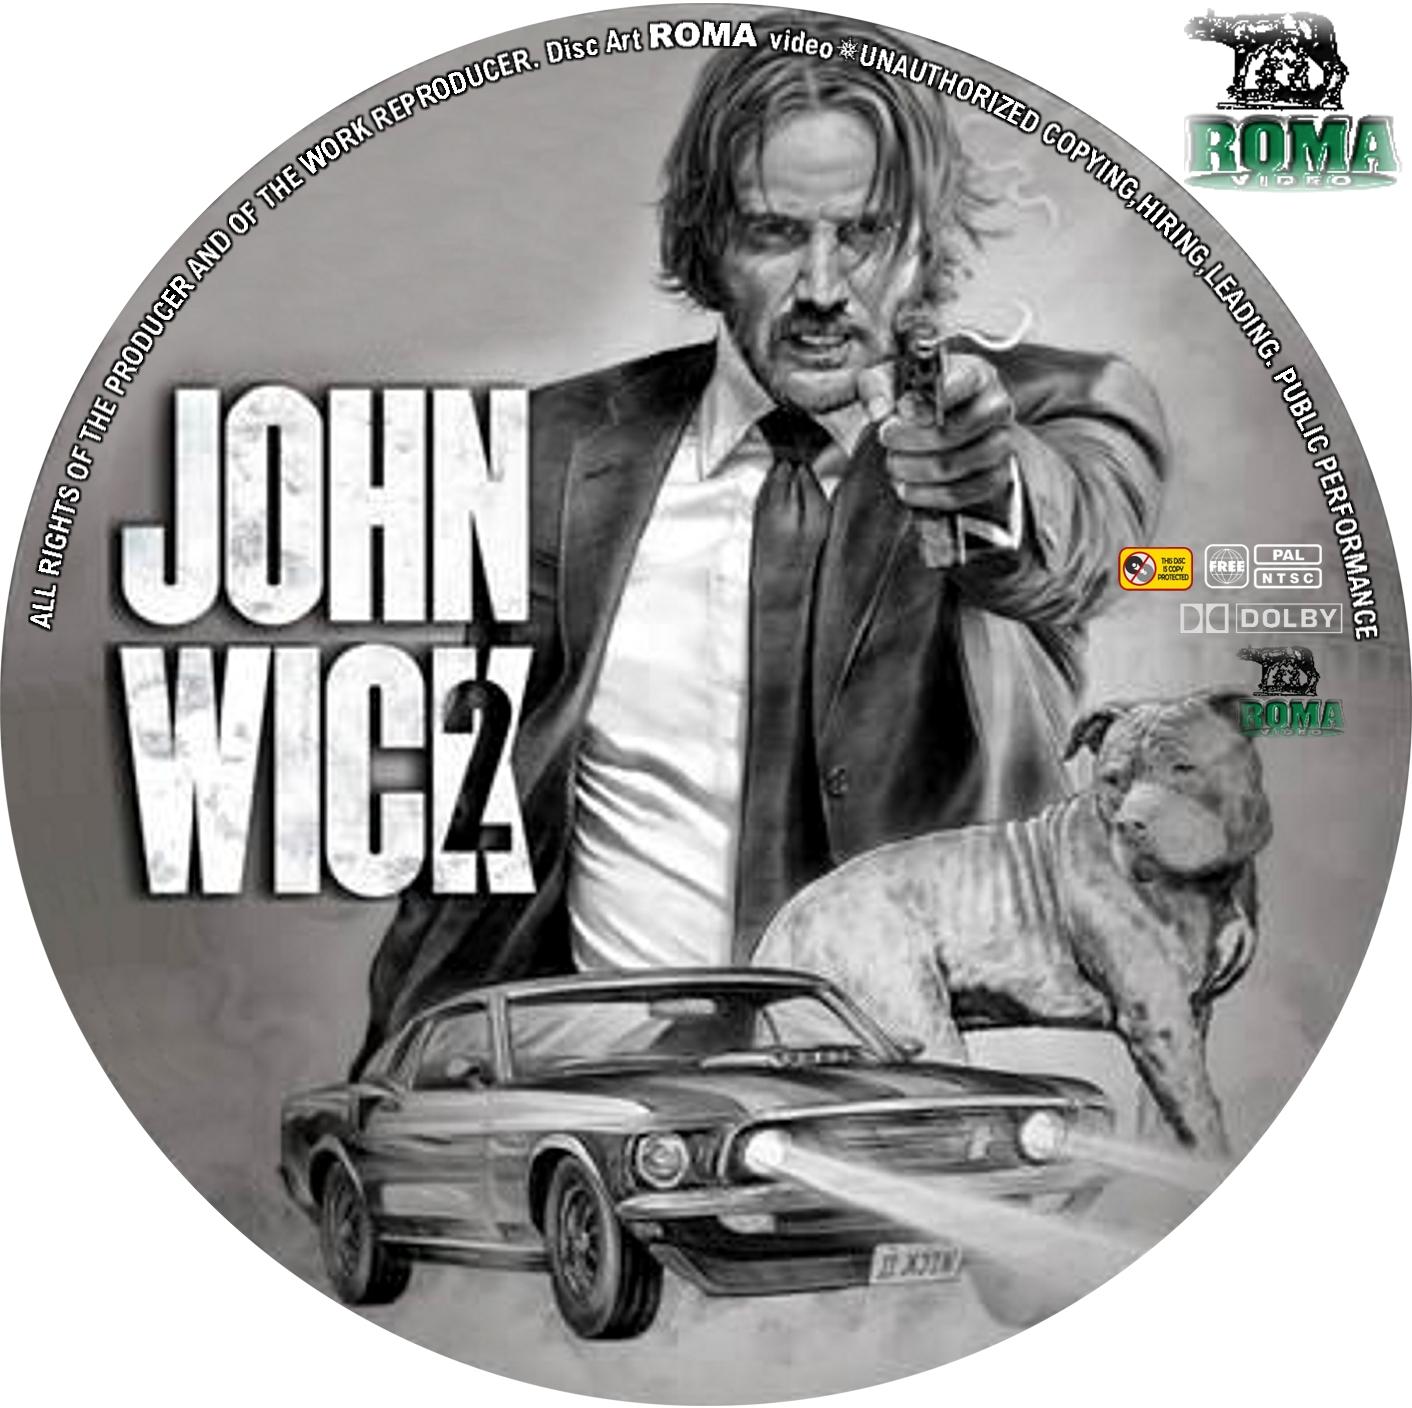 Coversboxsk John Wick 2 2017 High Quality Dvd Blueray